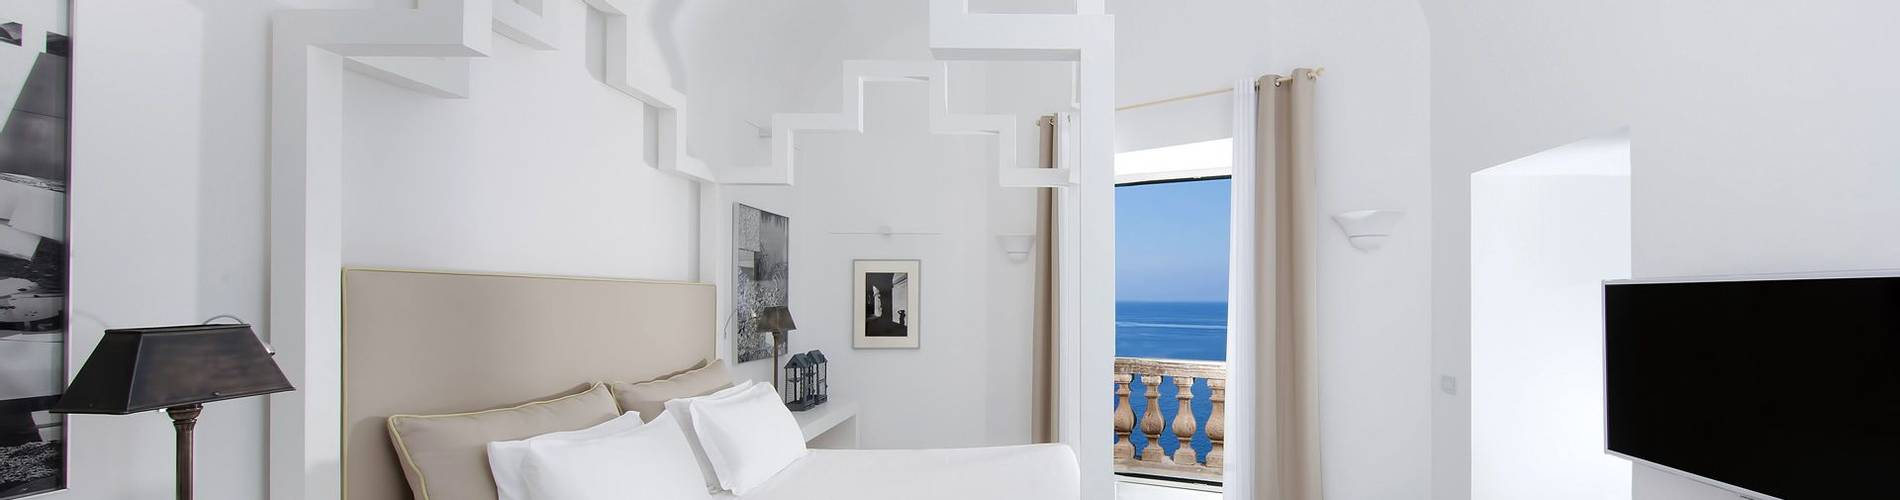 Bellevue Syrene, Sorrento, Italy, Camelia Suite.jpg